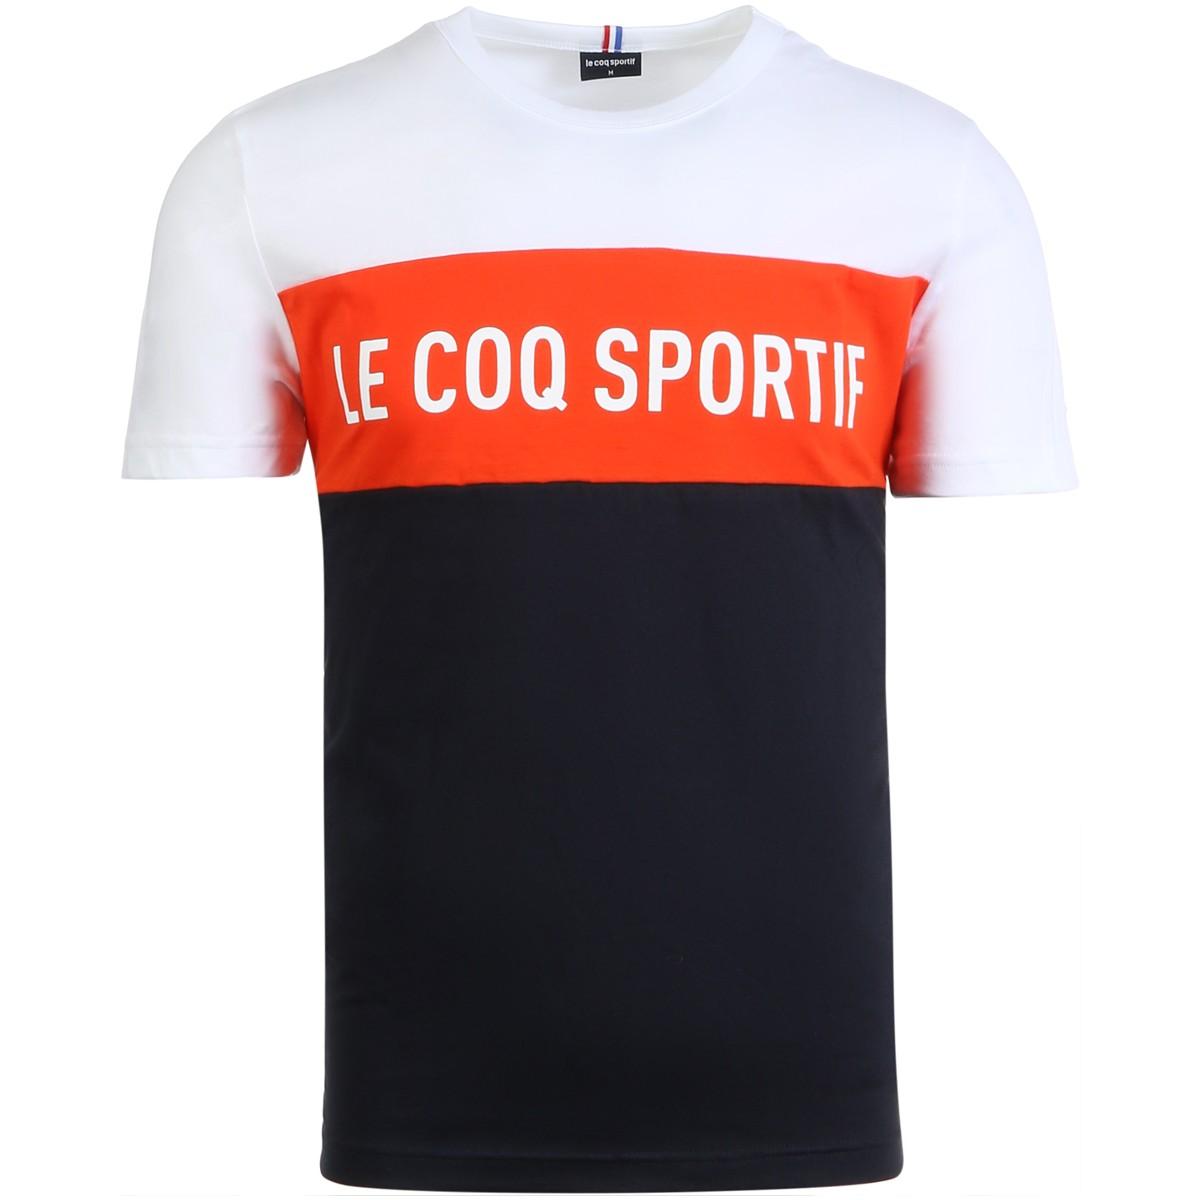 T-SHIRT LE COQ SPORTIF ESSENTIALS SEASON N°1